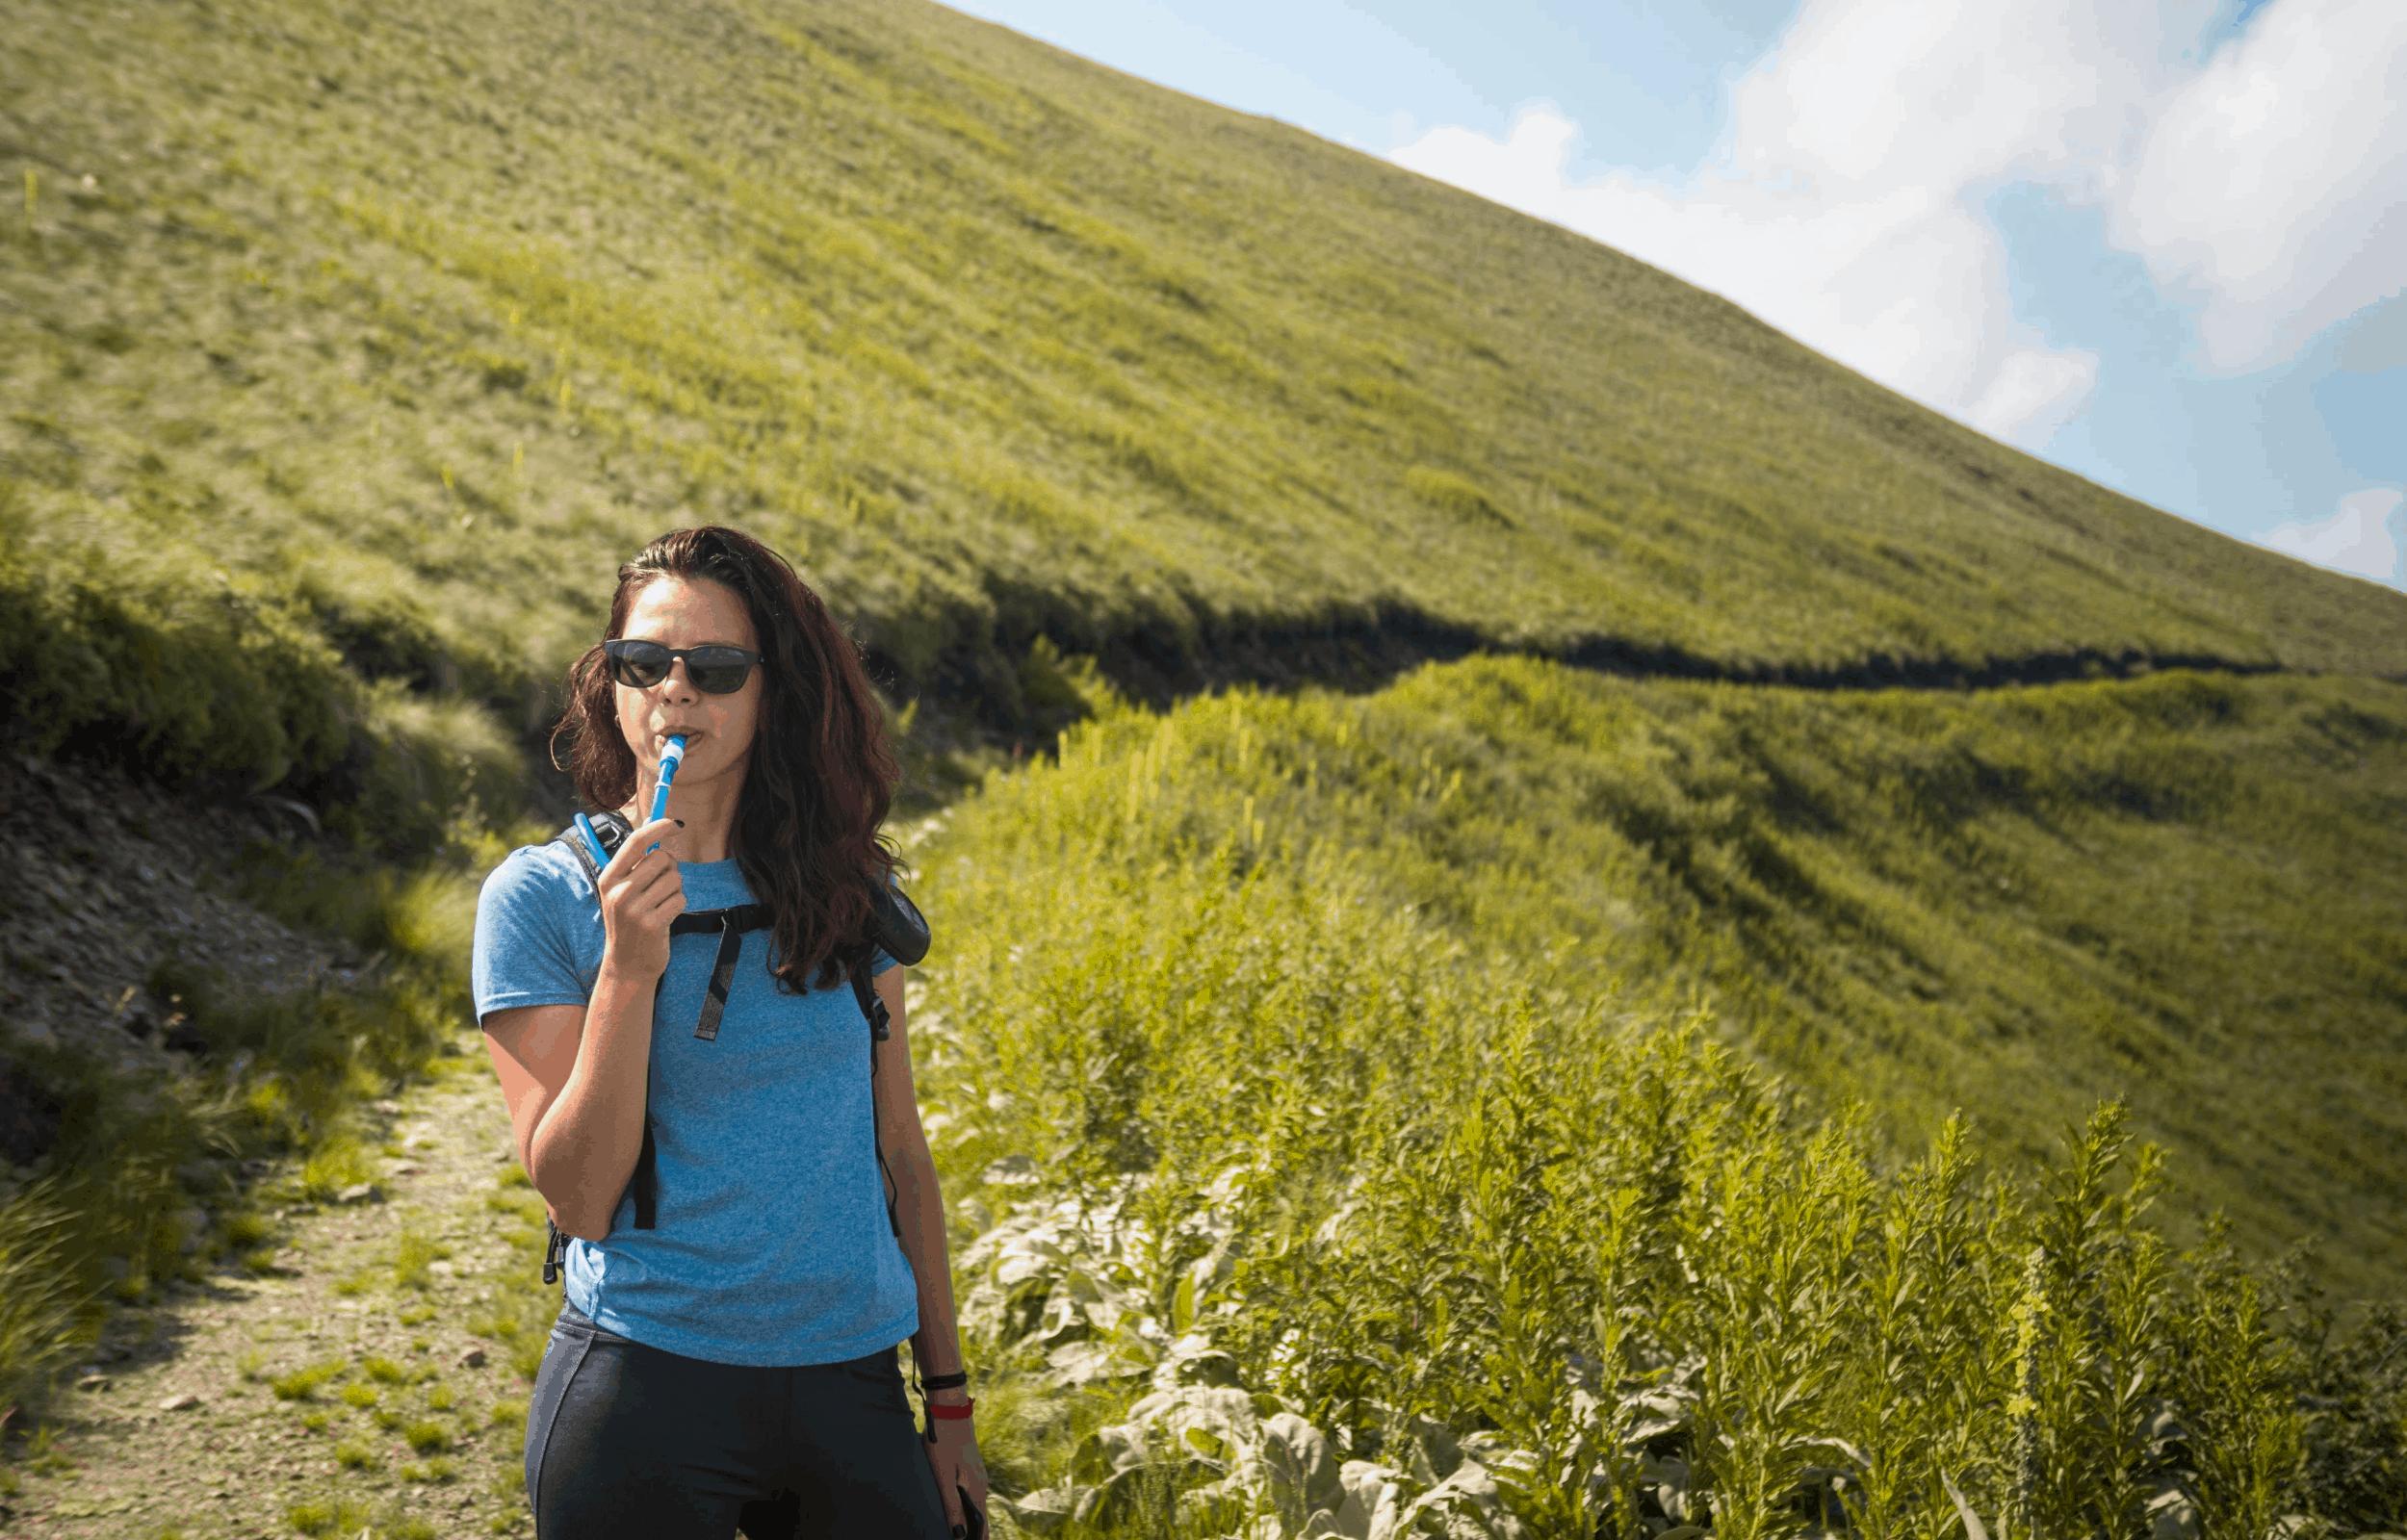 hydration bladder lady mountain hiking hydropack